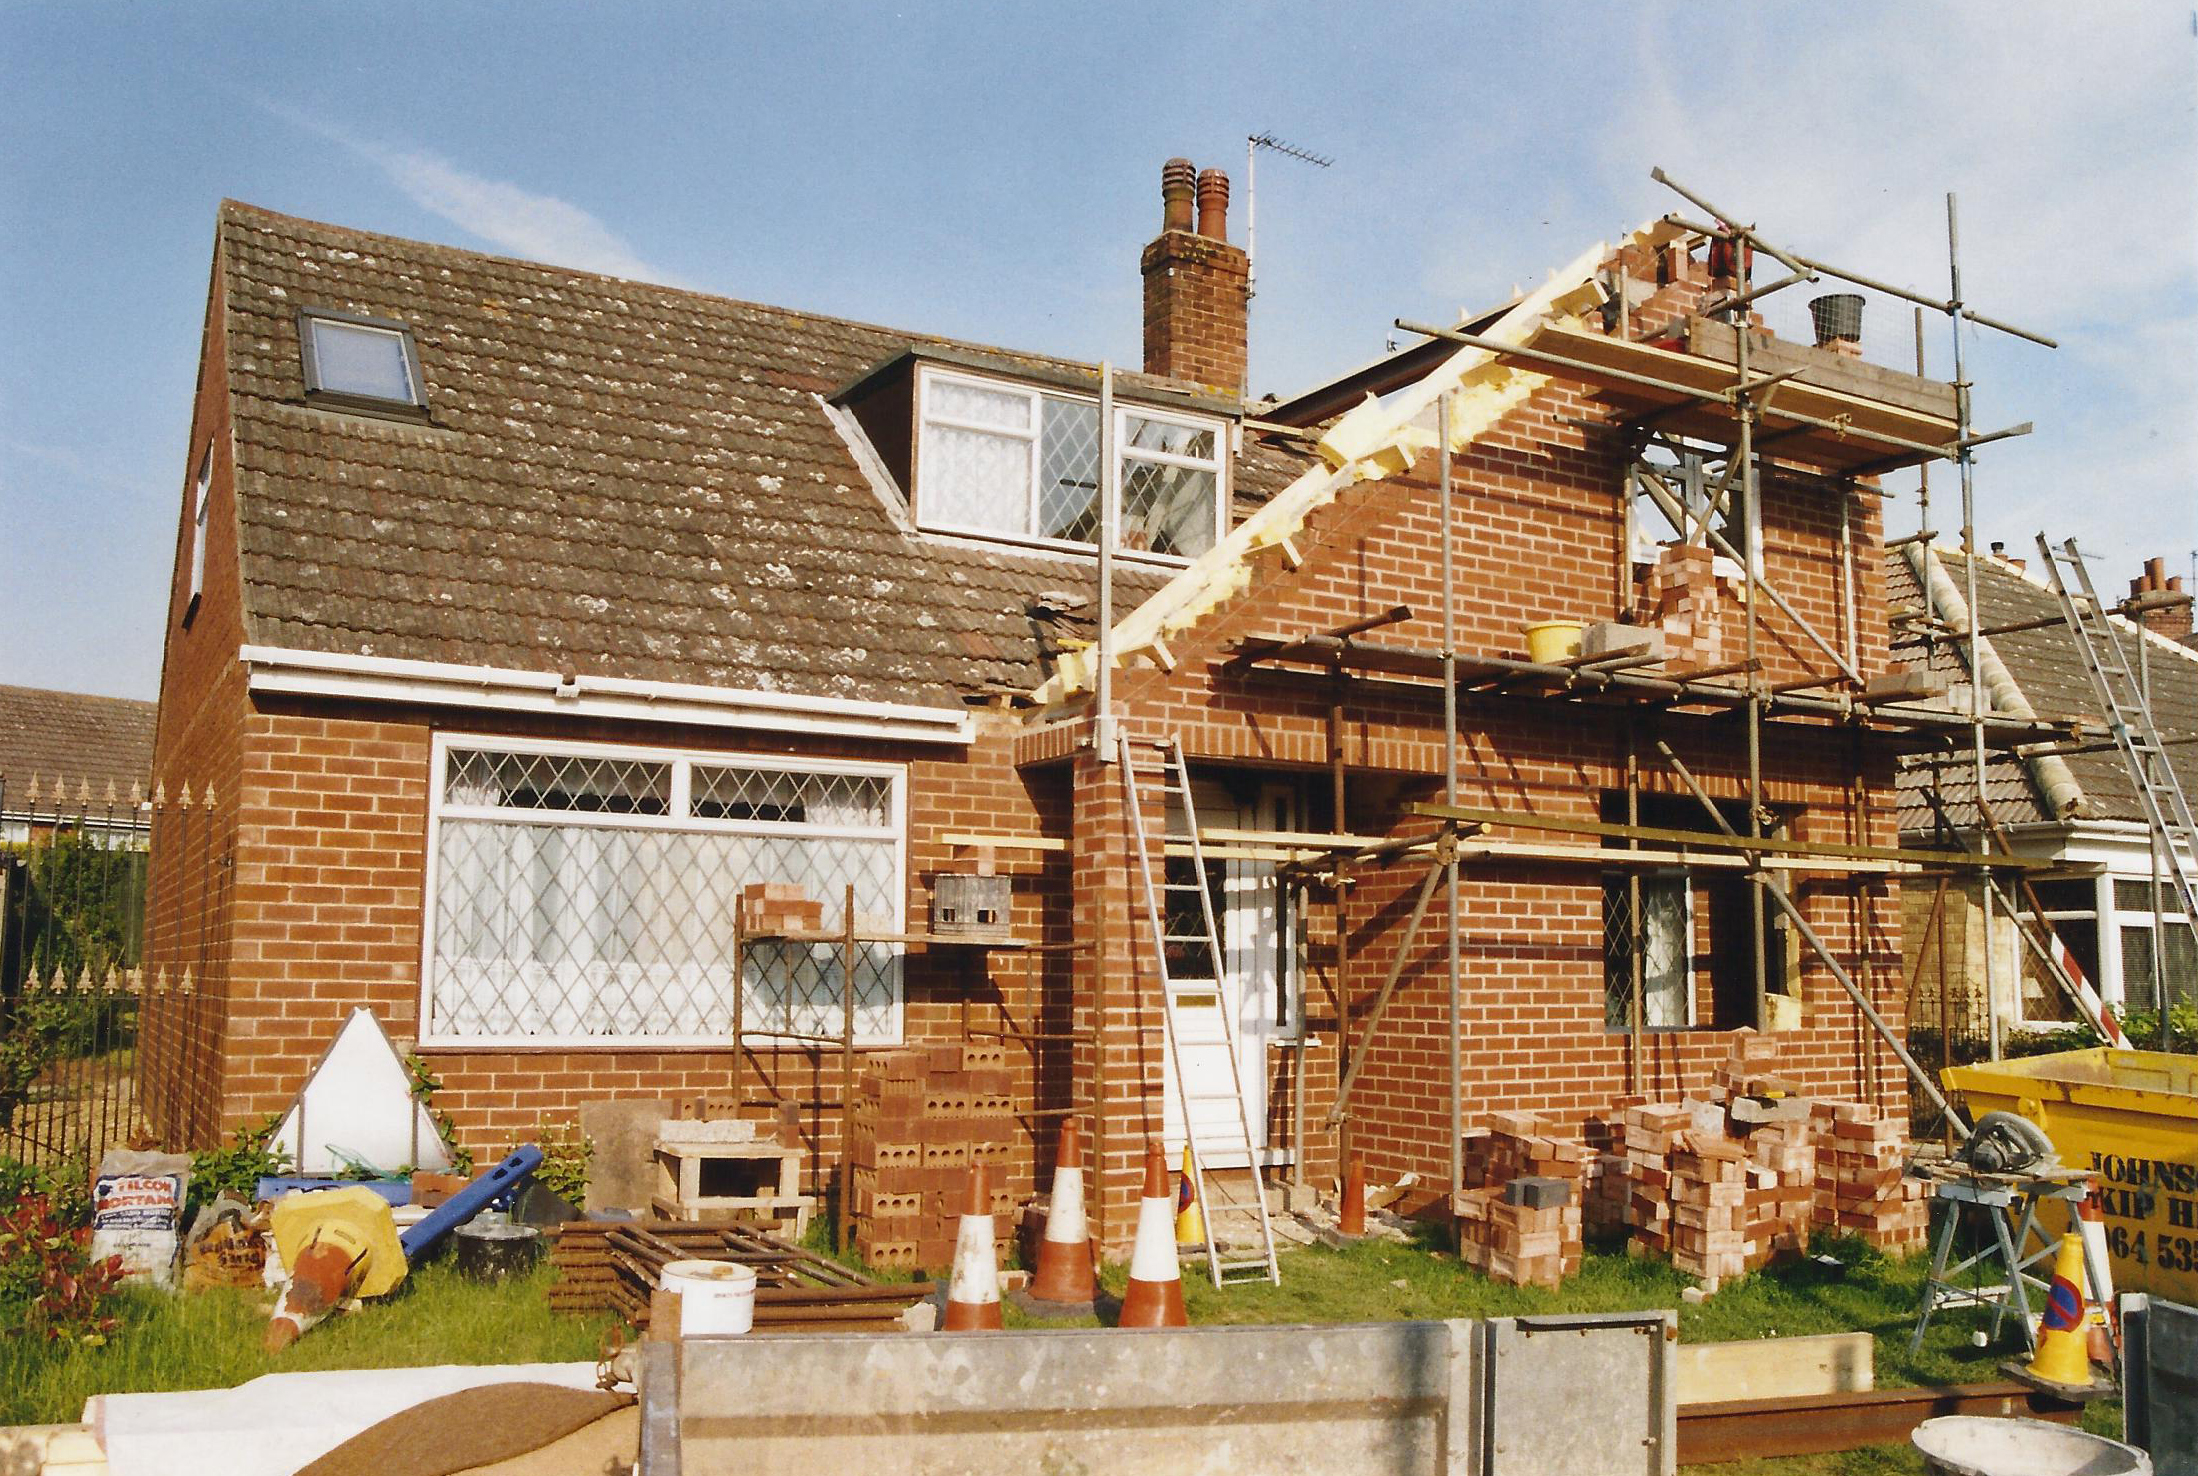 Construction 1 - Sproatley Cottage - East Yorkshire Architects - Samuel Kendall Associates.jpg.jpg